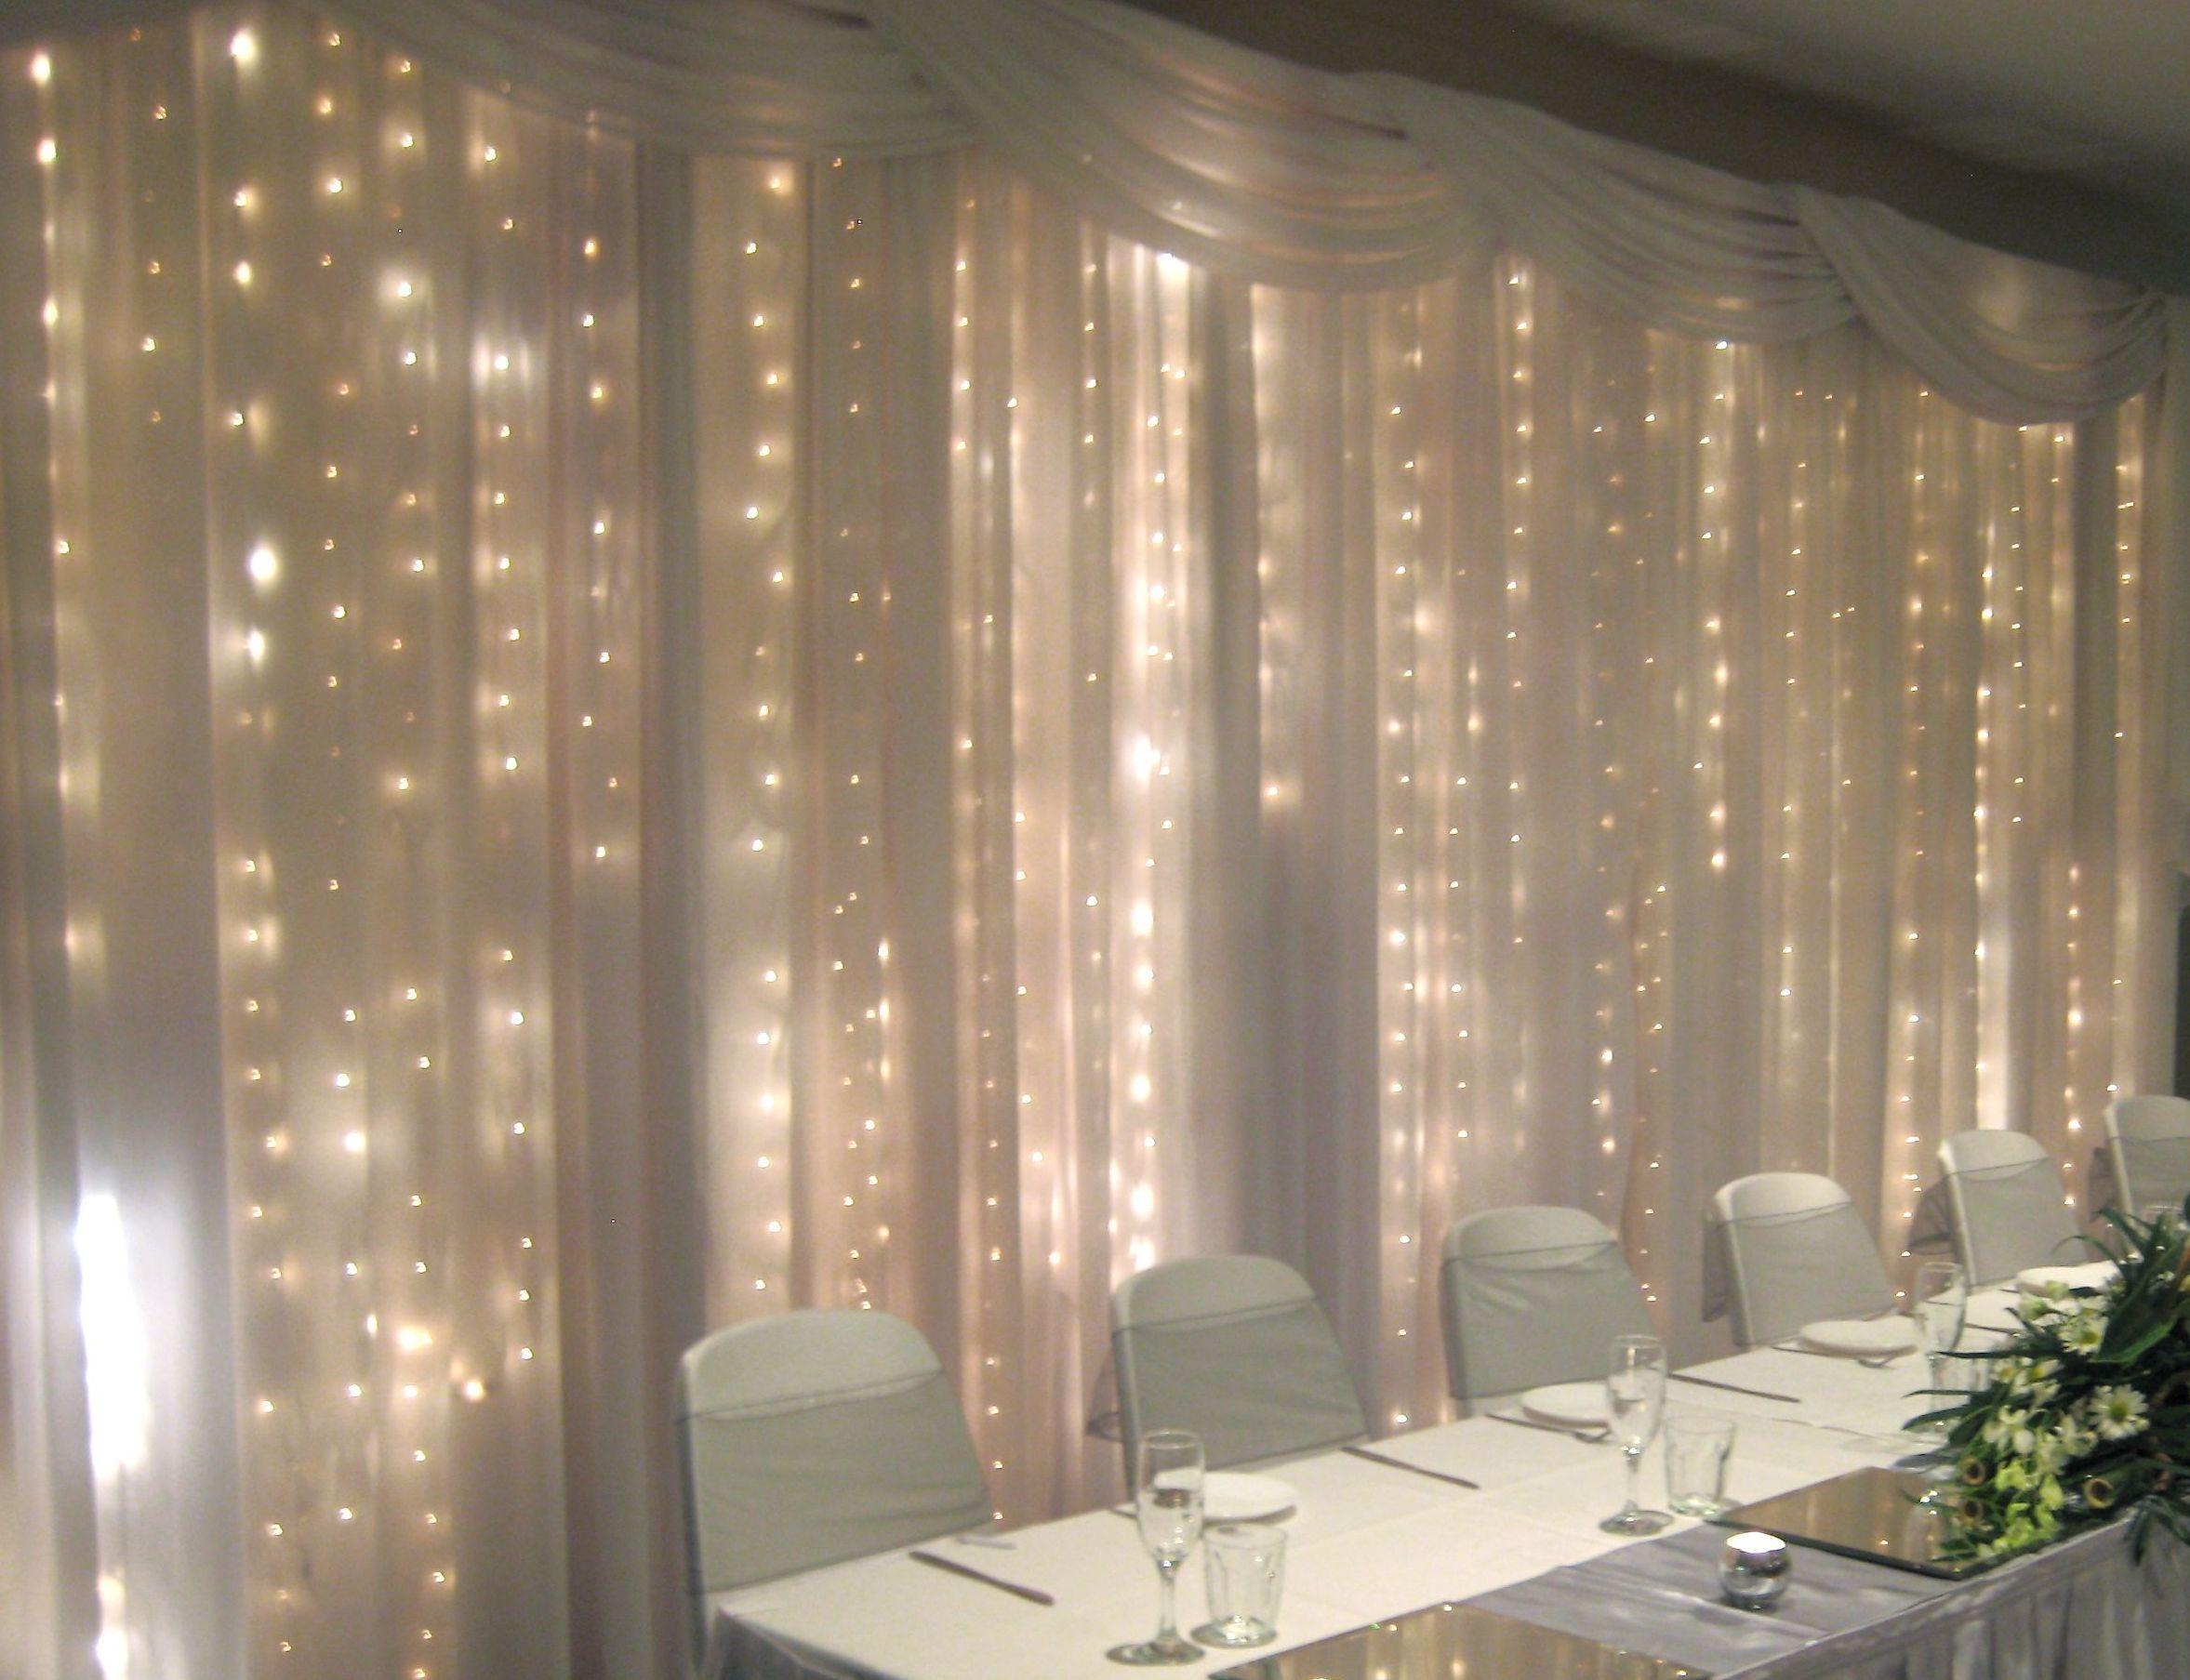 Wedding night bedroom decoration ideas  Wedding Backdrop  Good idea  Pinterest  Wedding Wedding